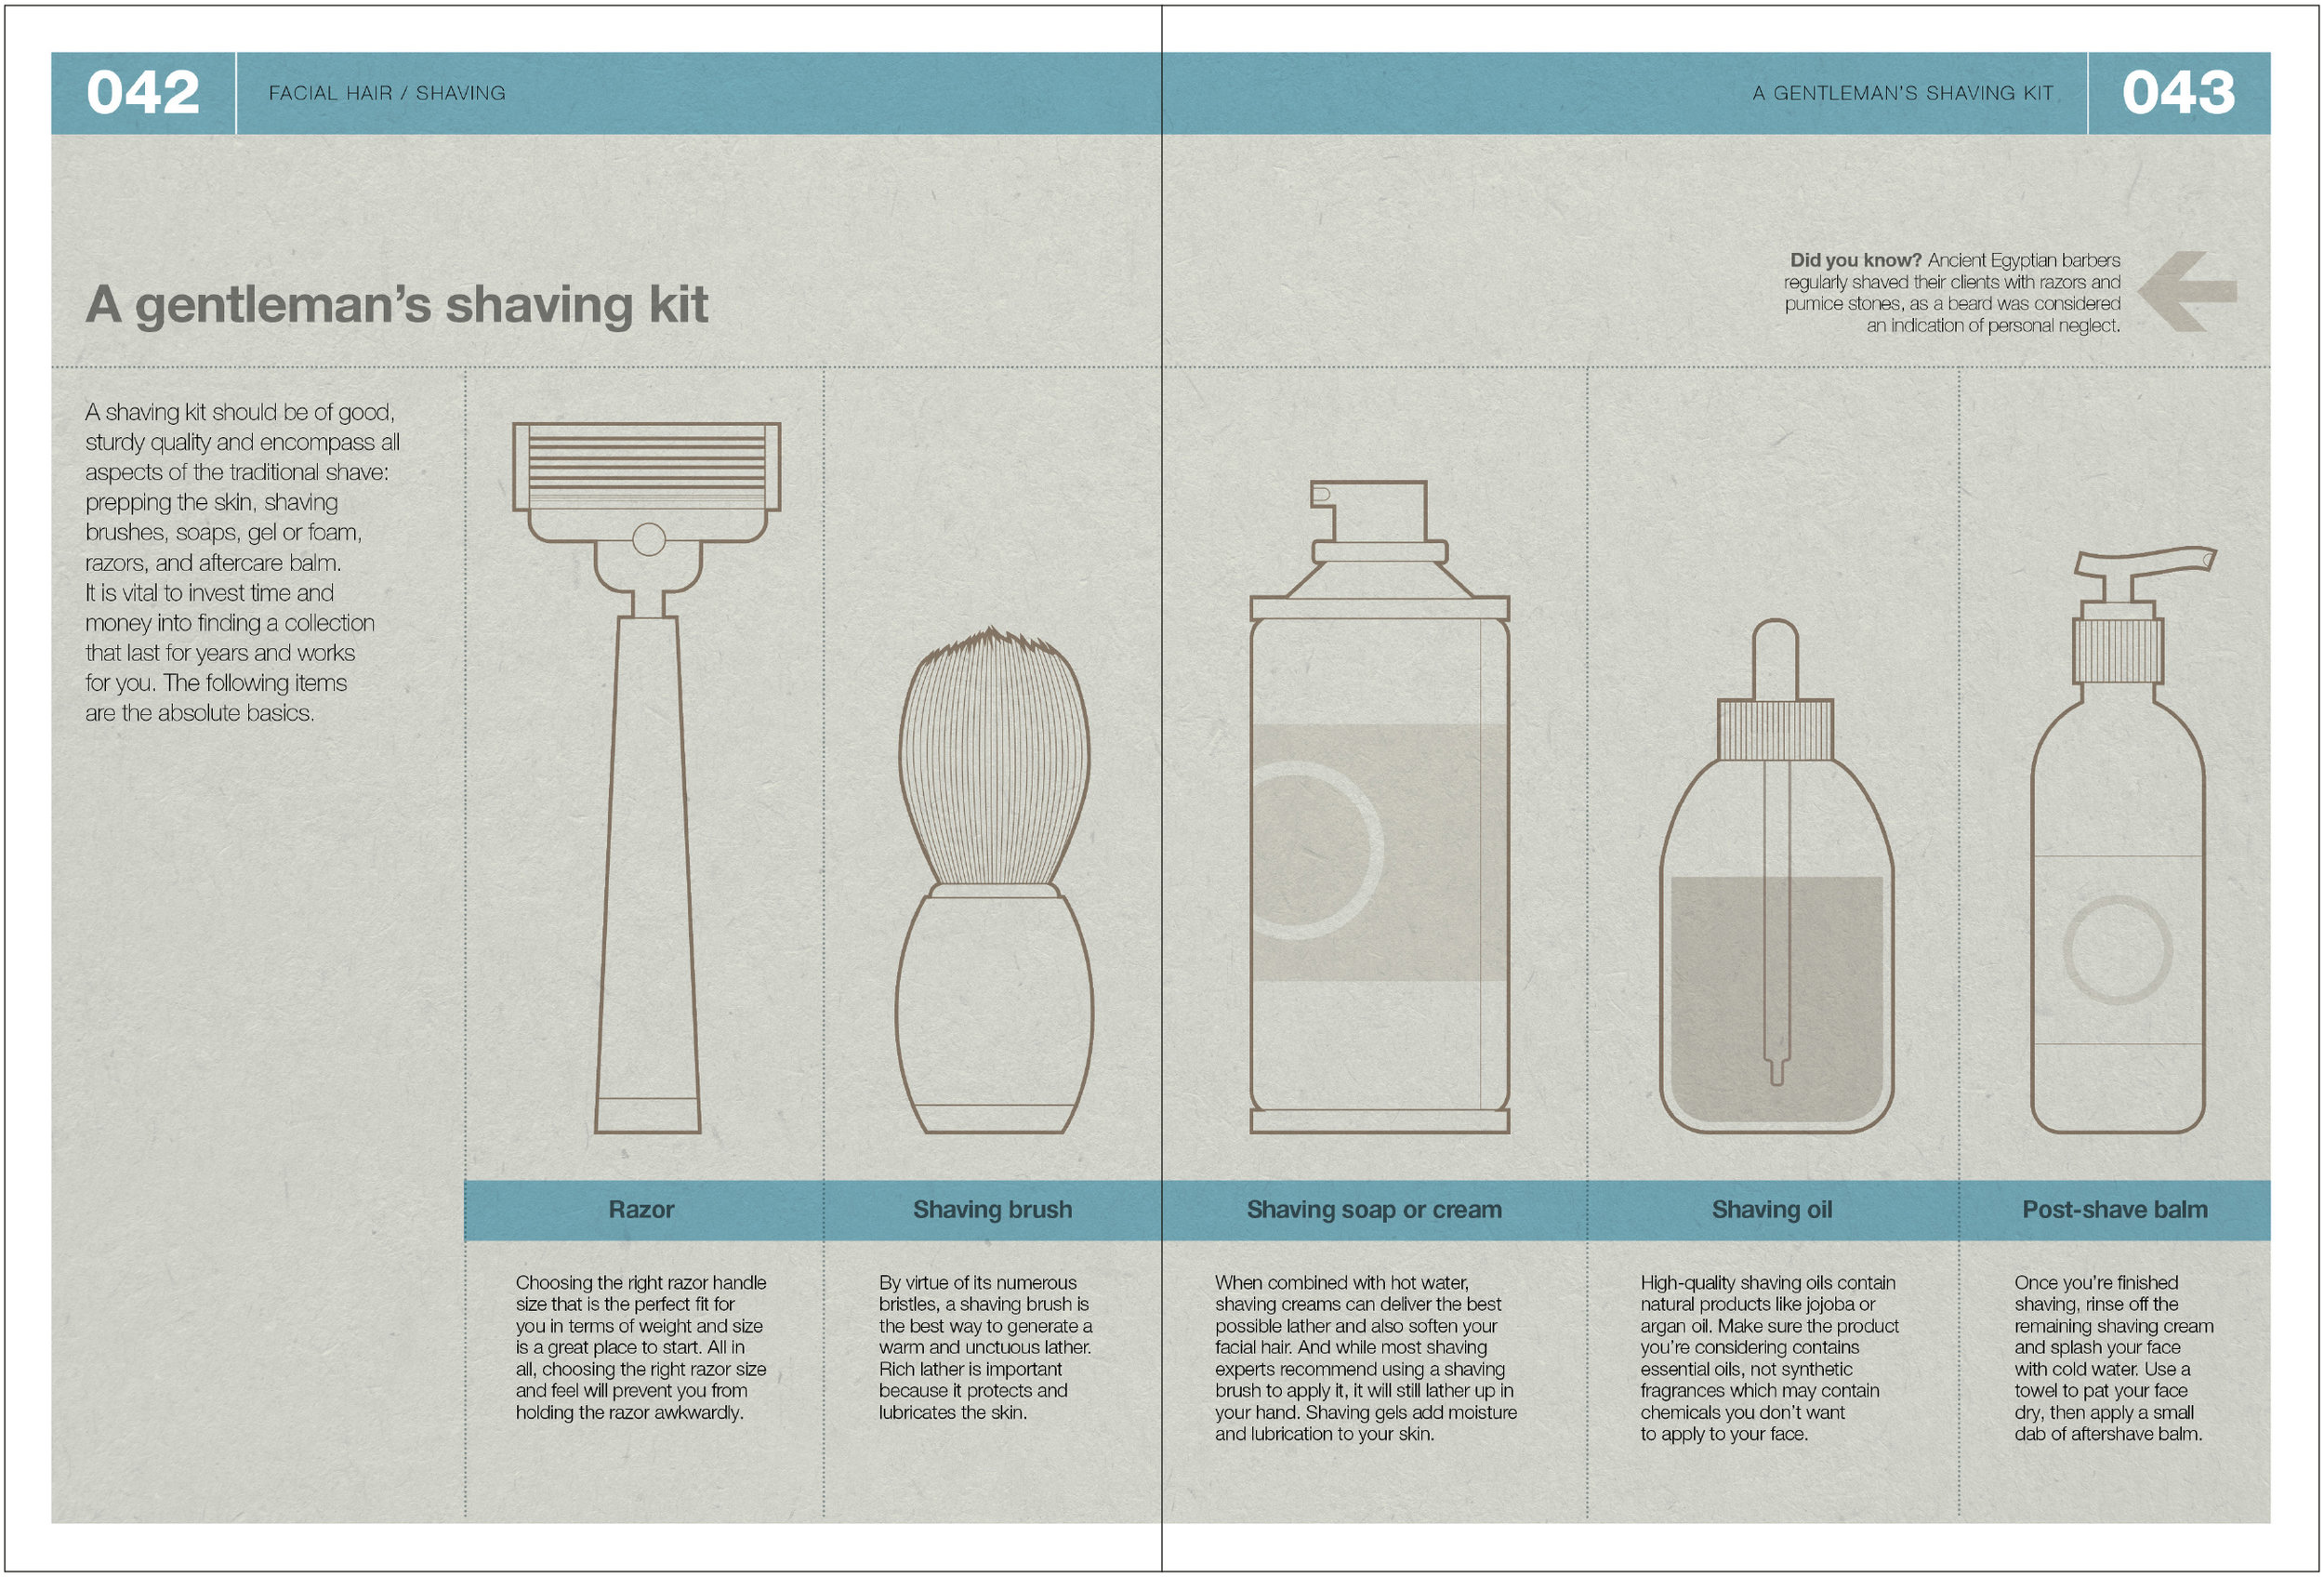 Skincare-5.jpg